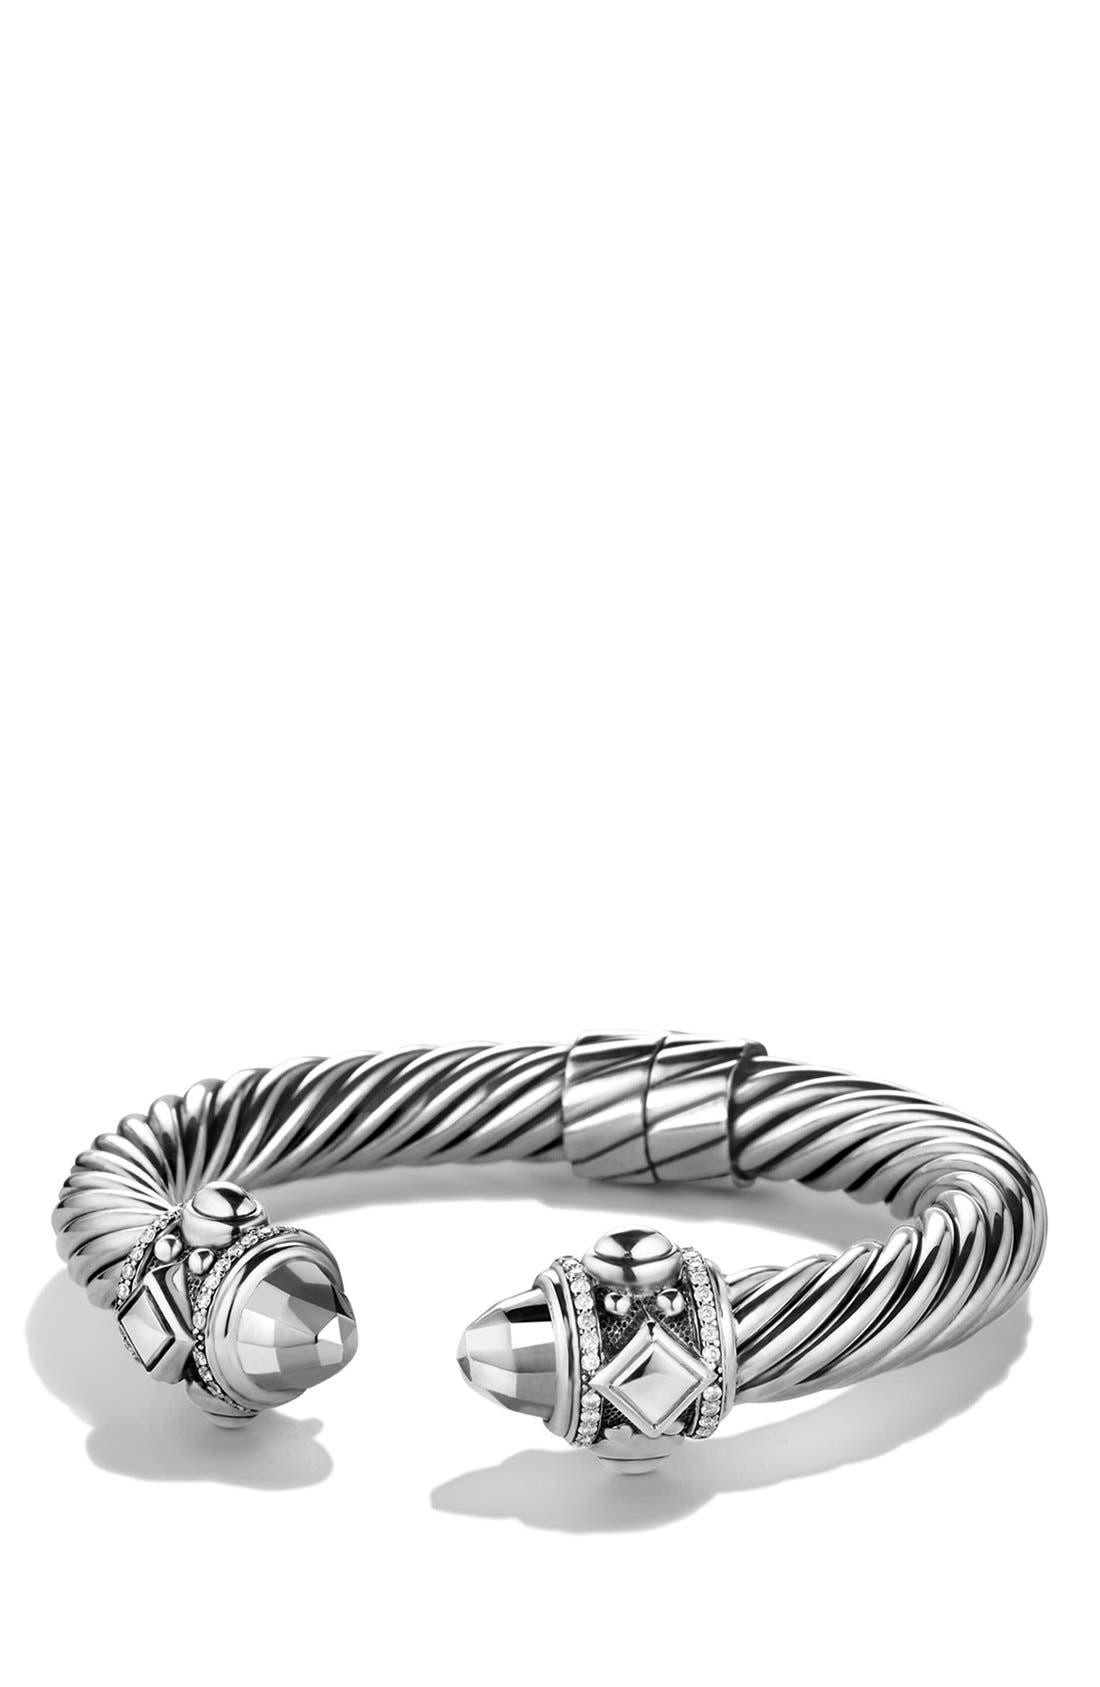 Alternate Image 1 Selected - David Yurman 'Renaissance' Bracelet with Black Diamonds